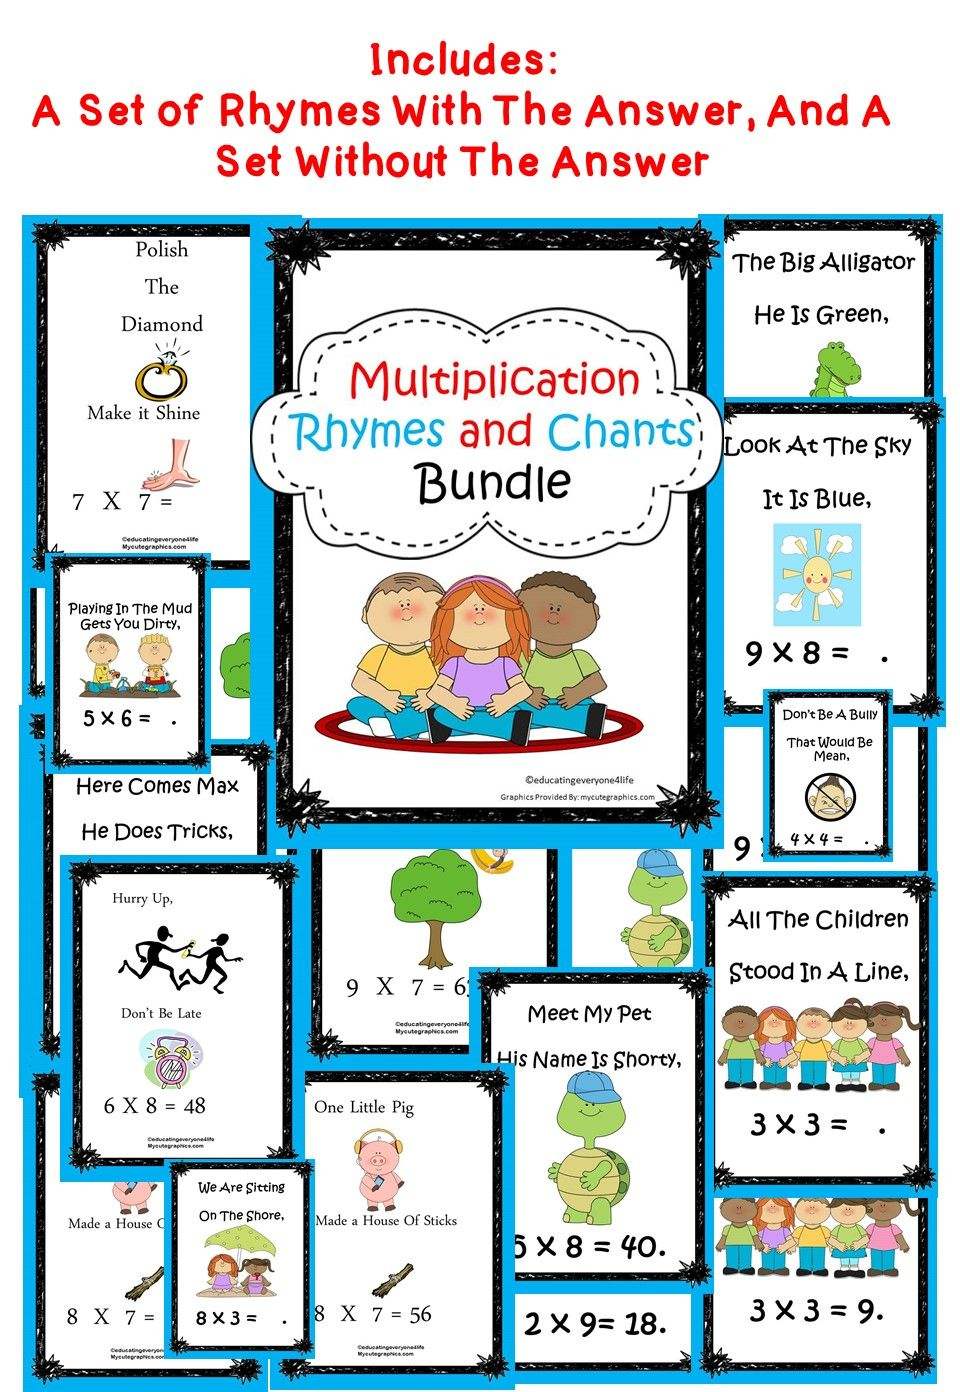 Multiplication Rhymes And Chants | Homeschool Math, How To within Printable Multiplication Rhymes